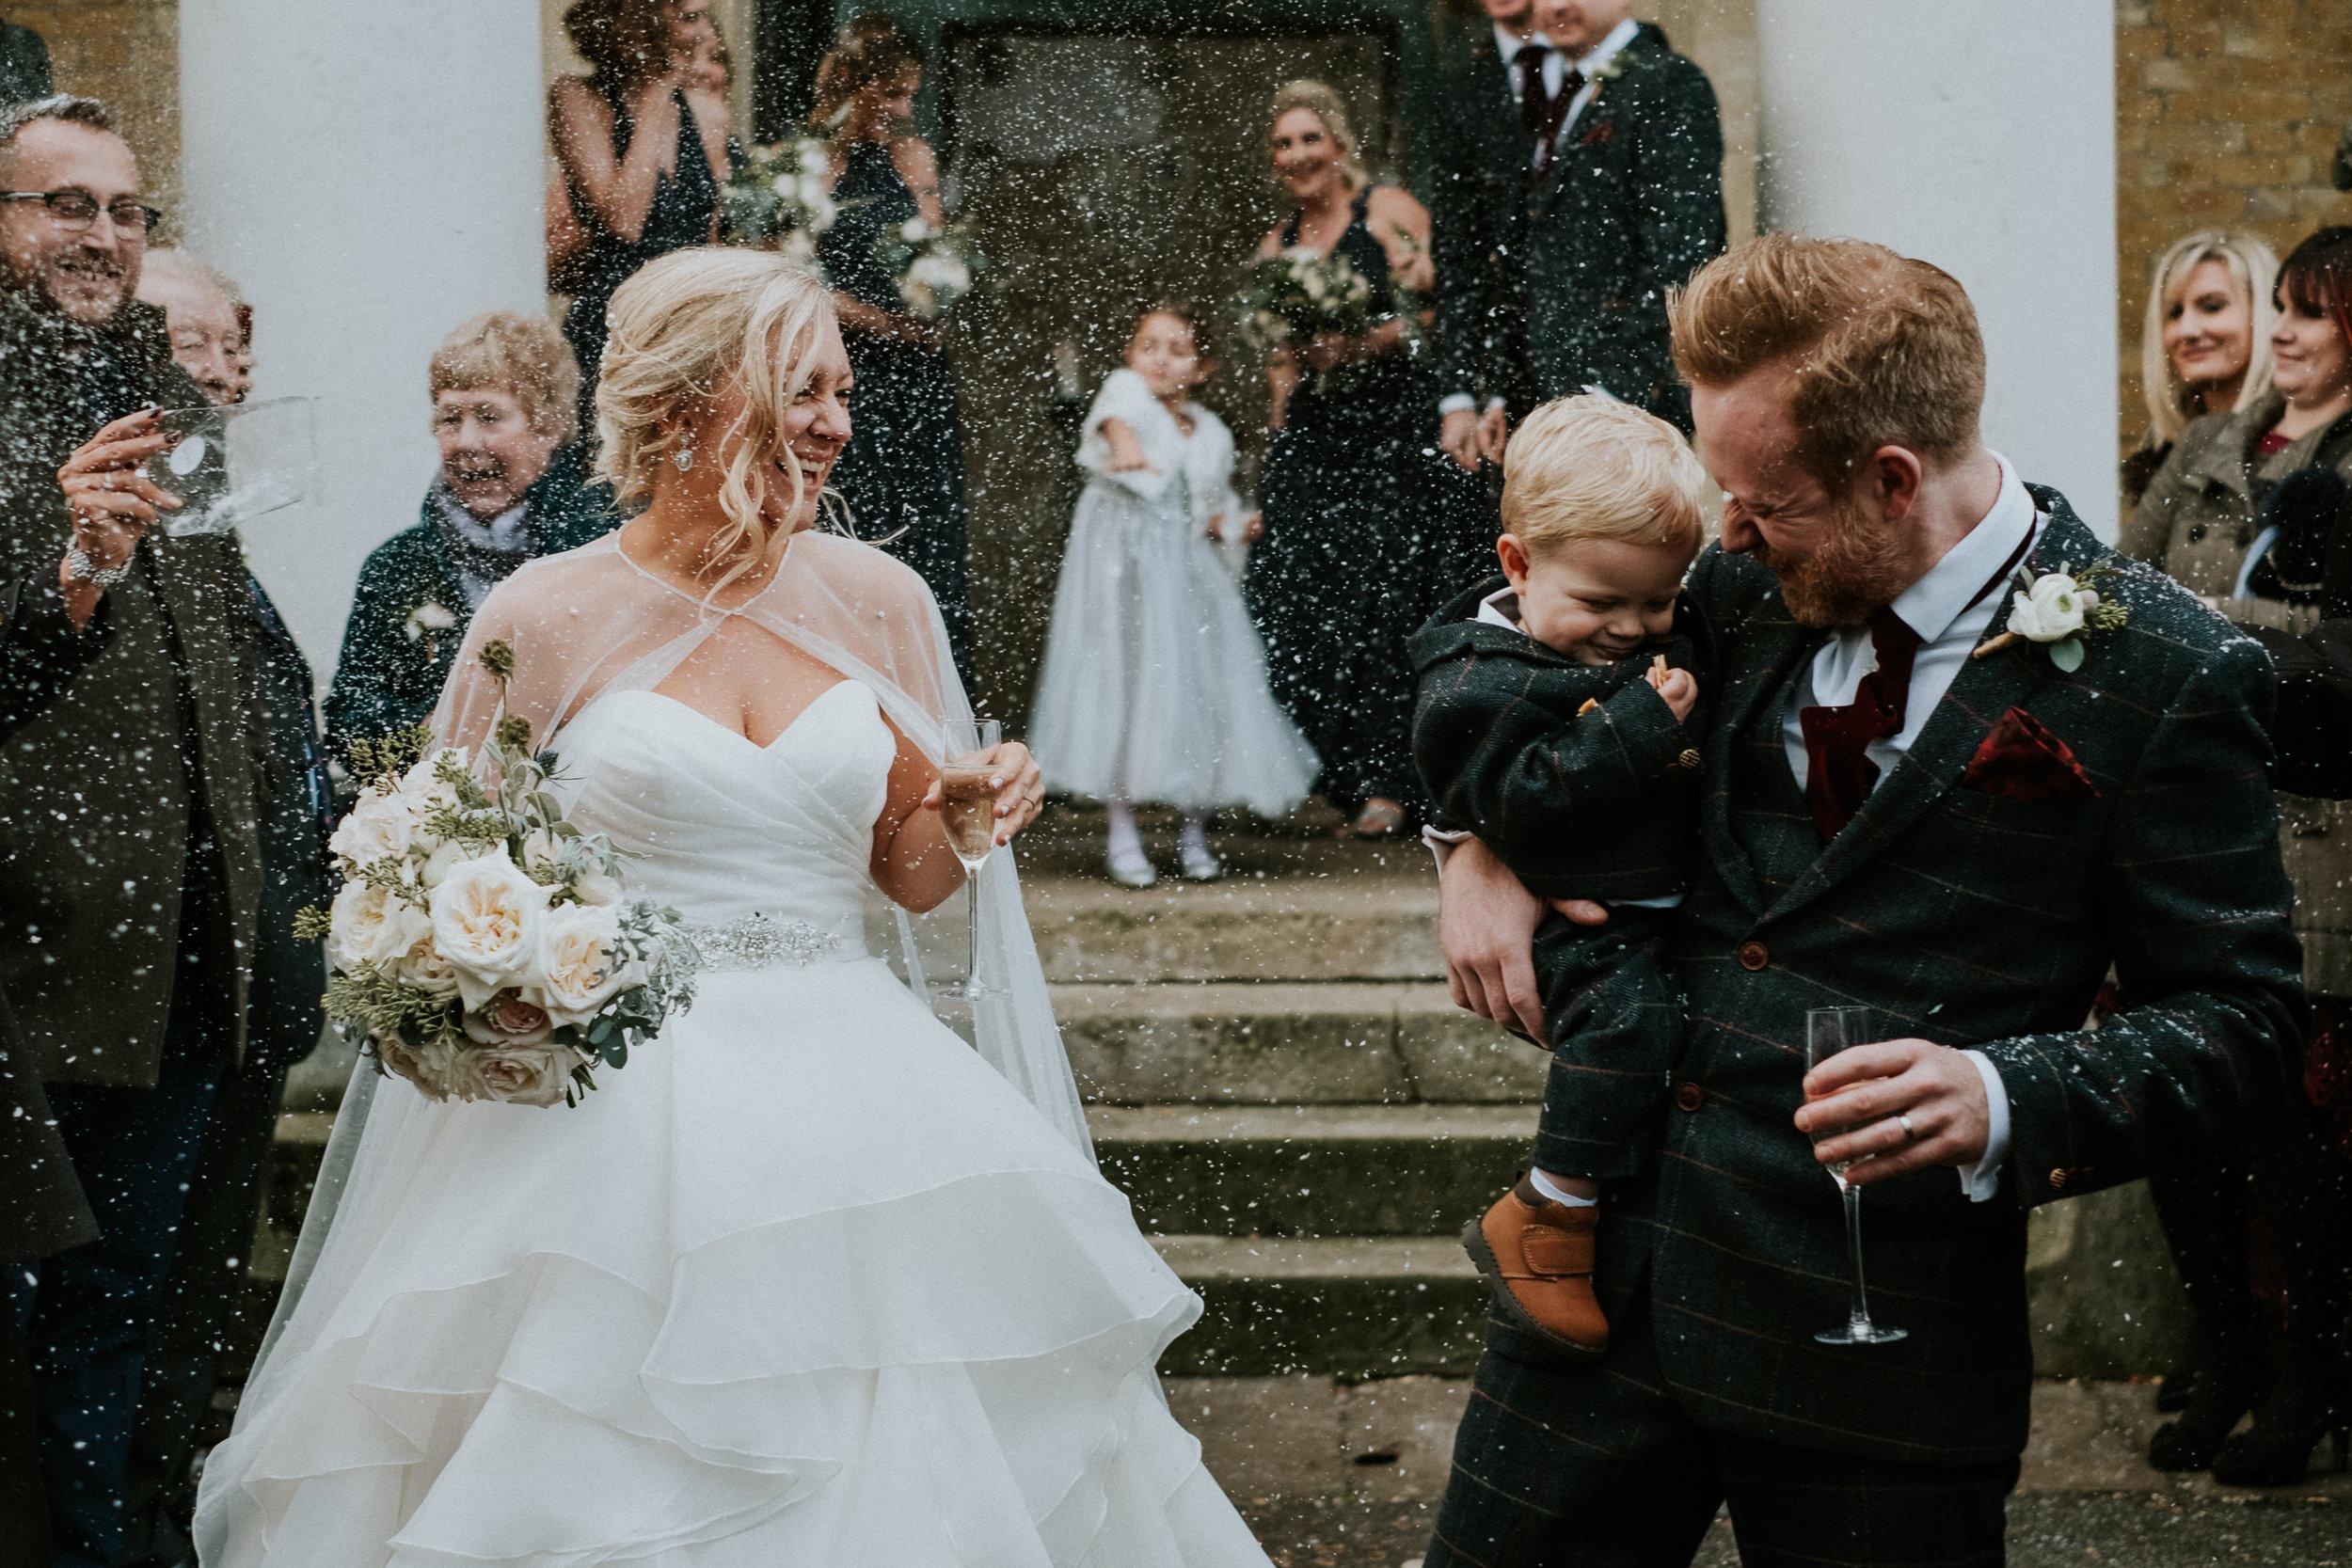 34 London Wedding Winter Christmas Asylum Chapel Photography St Barts Brewery Joanna nicole Photography1.jpg